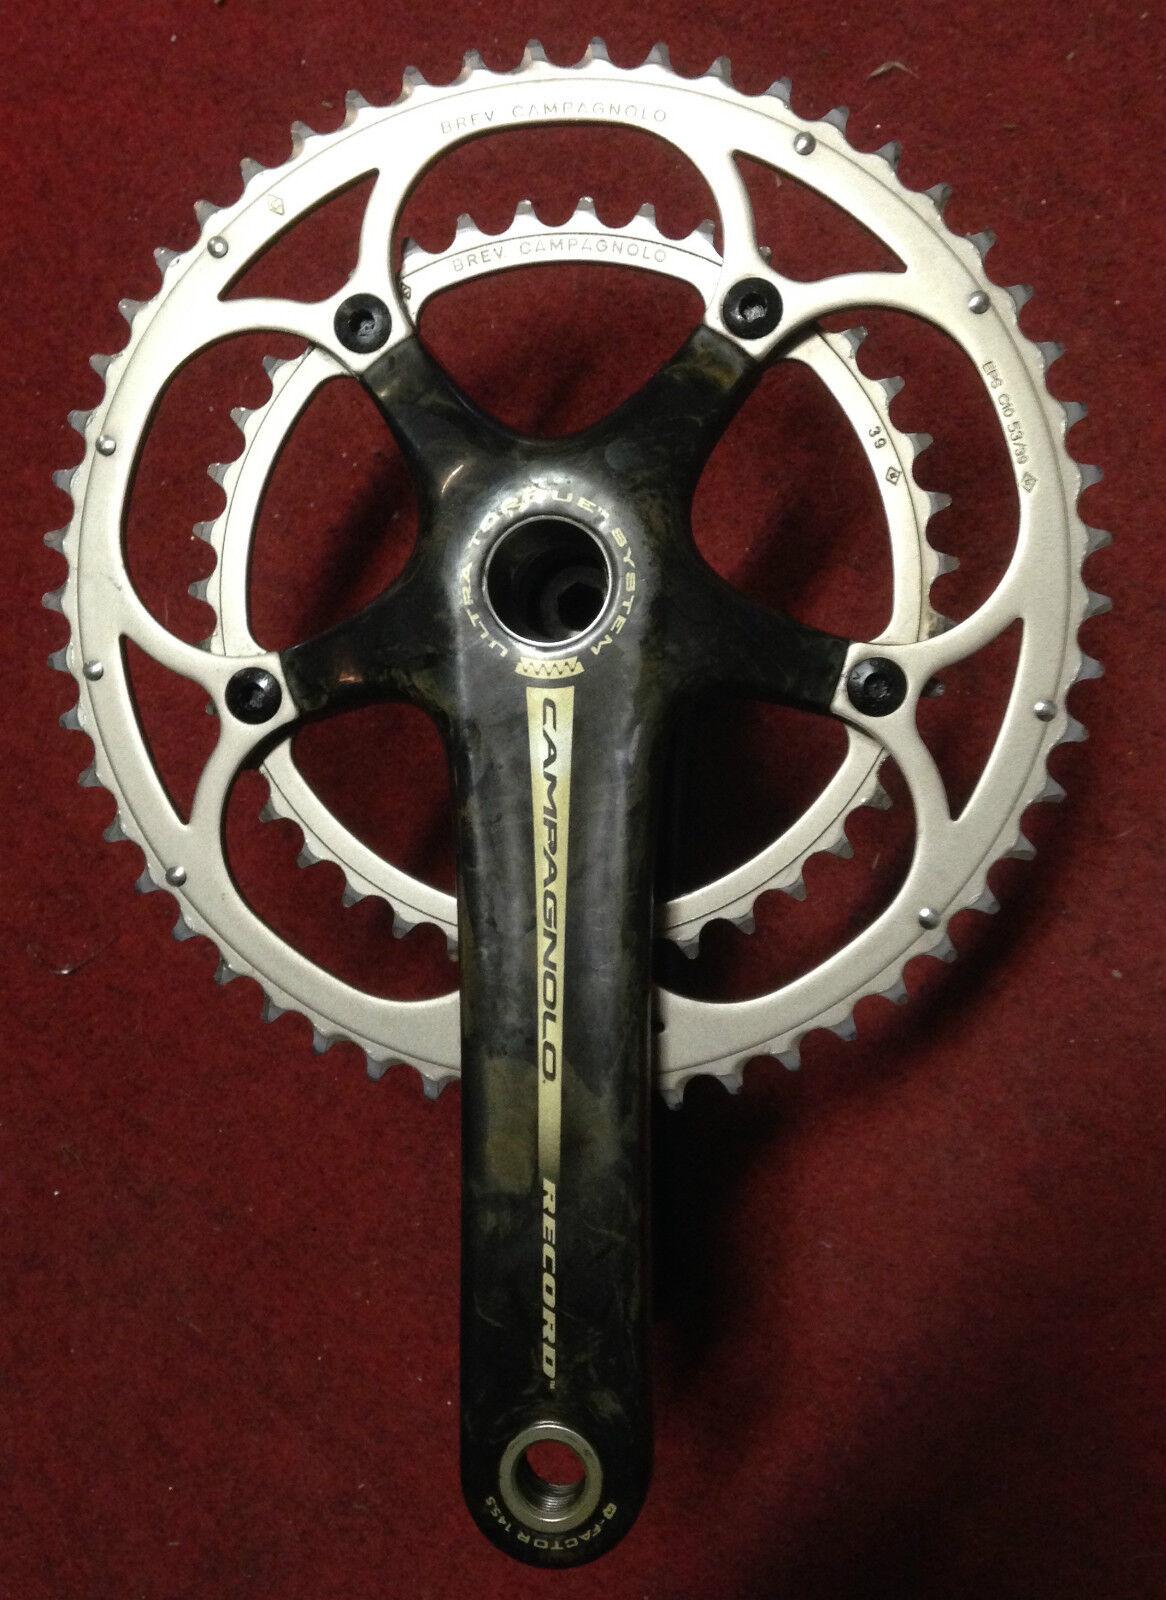 Pédalier Campagnolo Record carbone bicicleta crankset 170 39-53 10 s